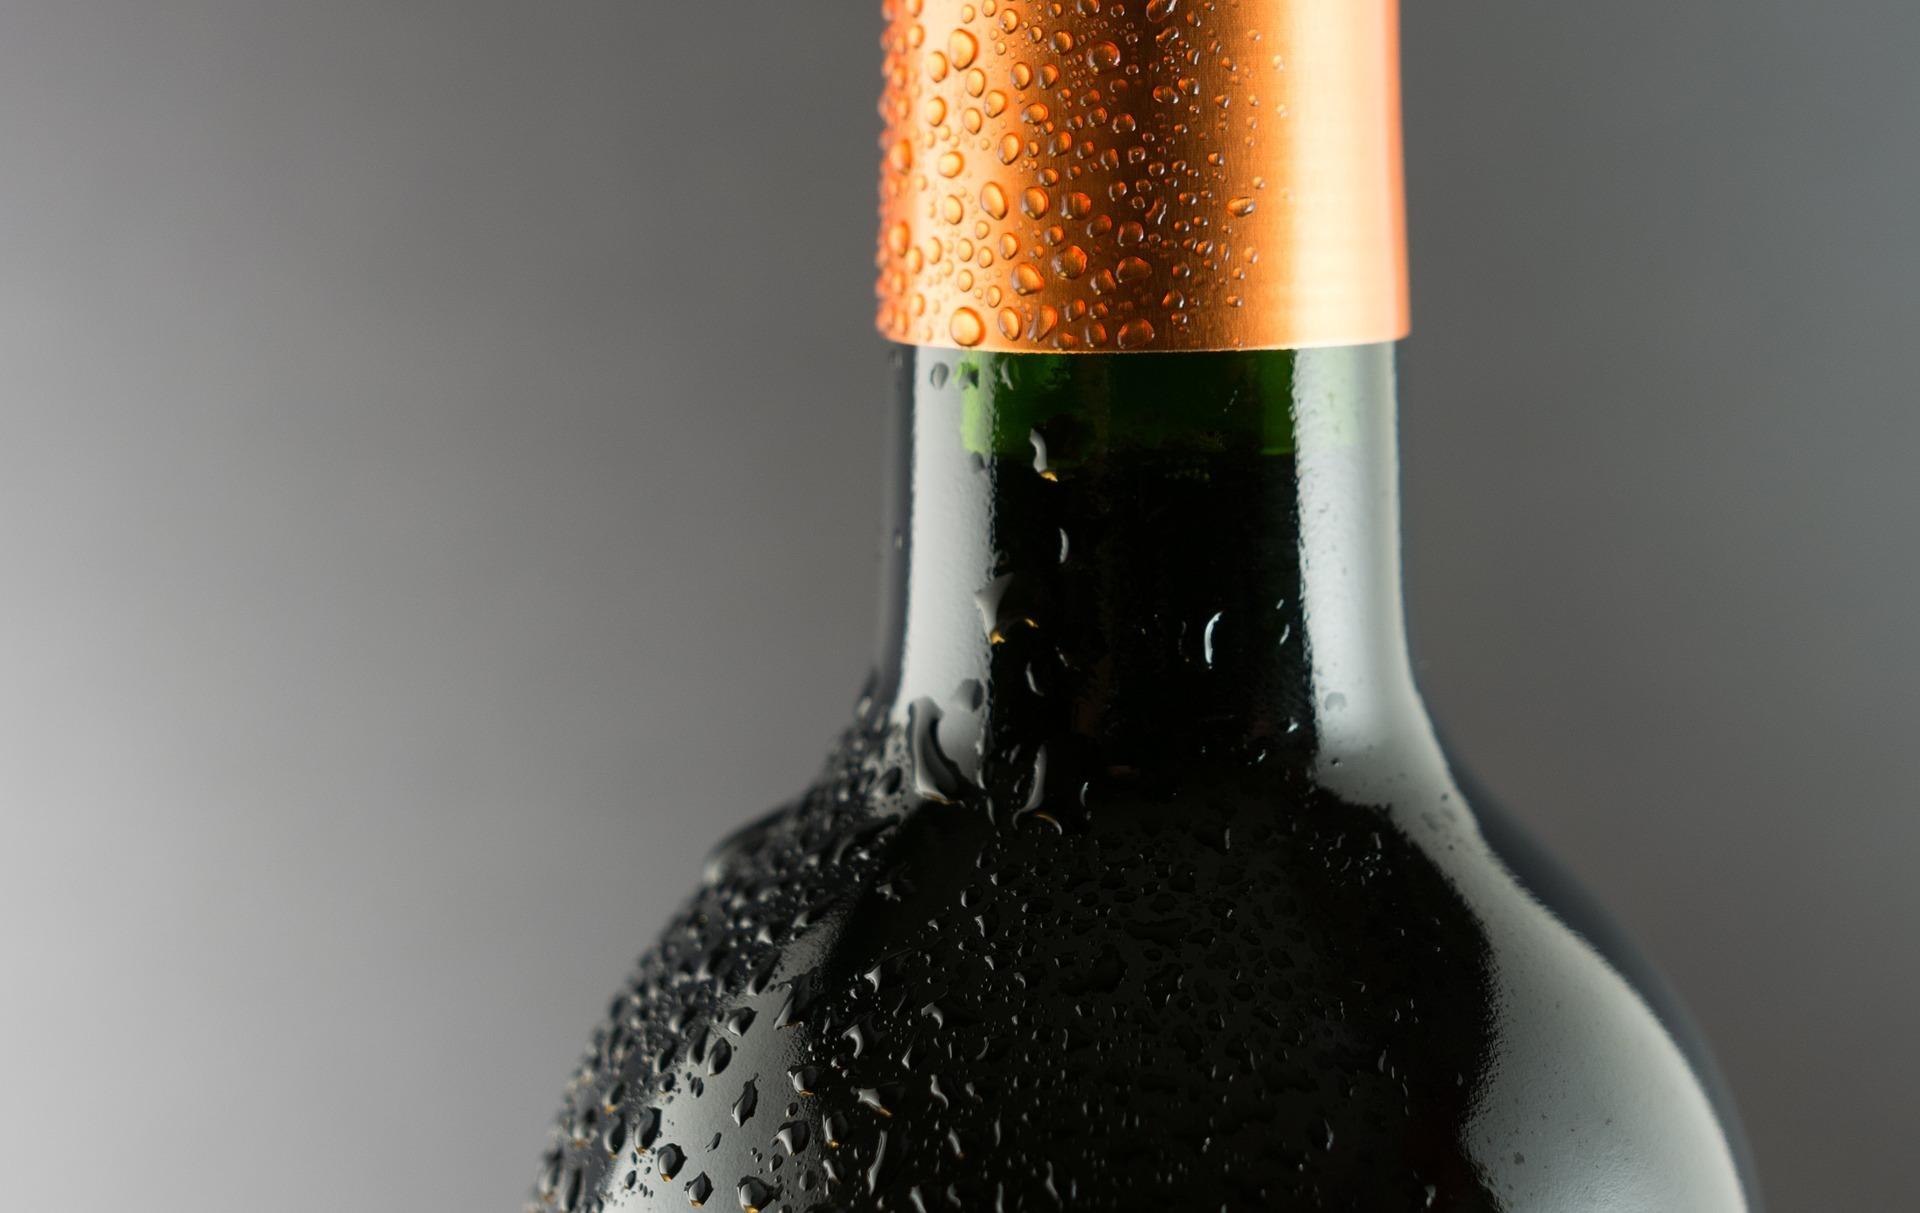 alcohol-1281605_1920.jpg